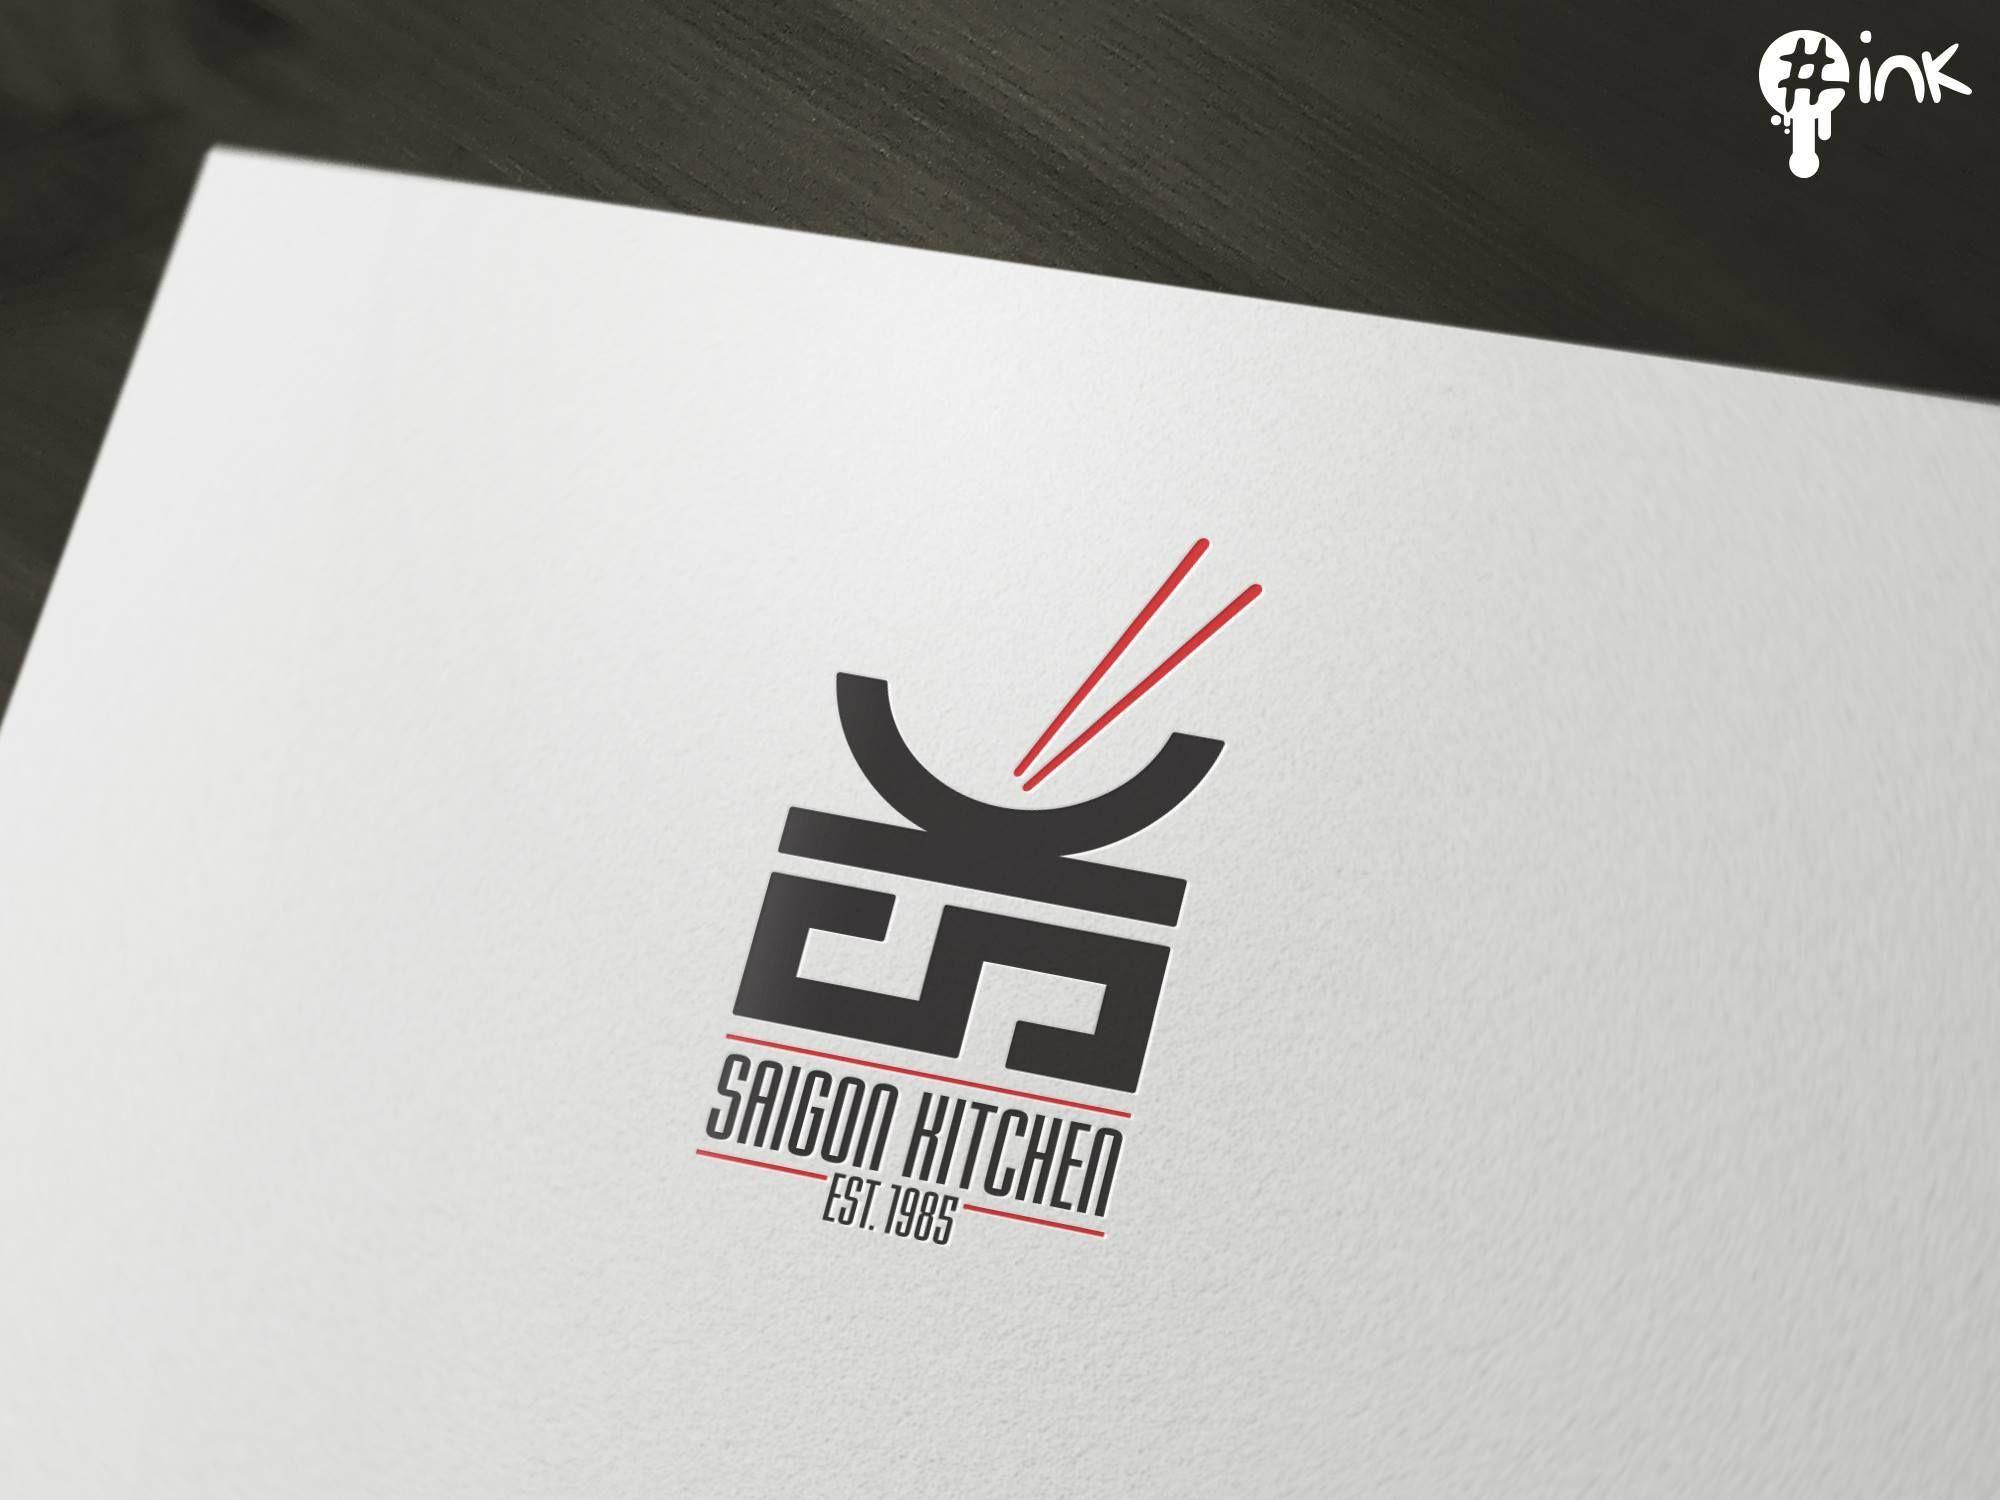 Unique & smart logo design for Saigon Kitchen, an Asian restaurant ...